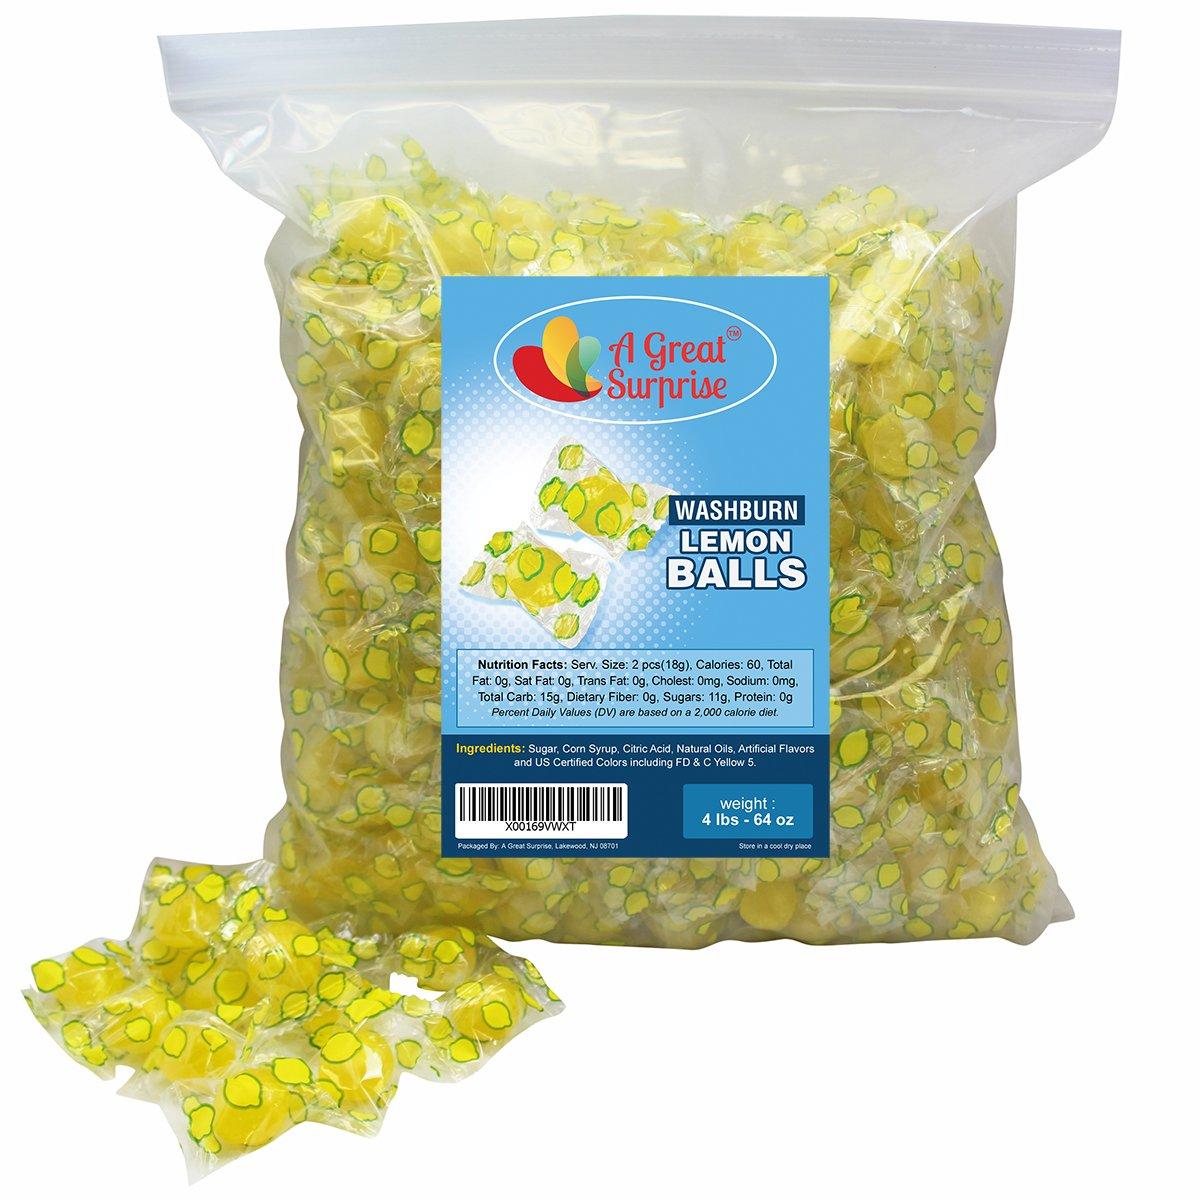 Amazon.com : Sour Lemon Drops Hard Candy - Washburns Old Fashioned ...